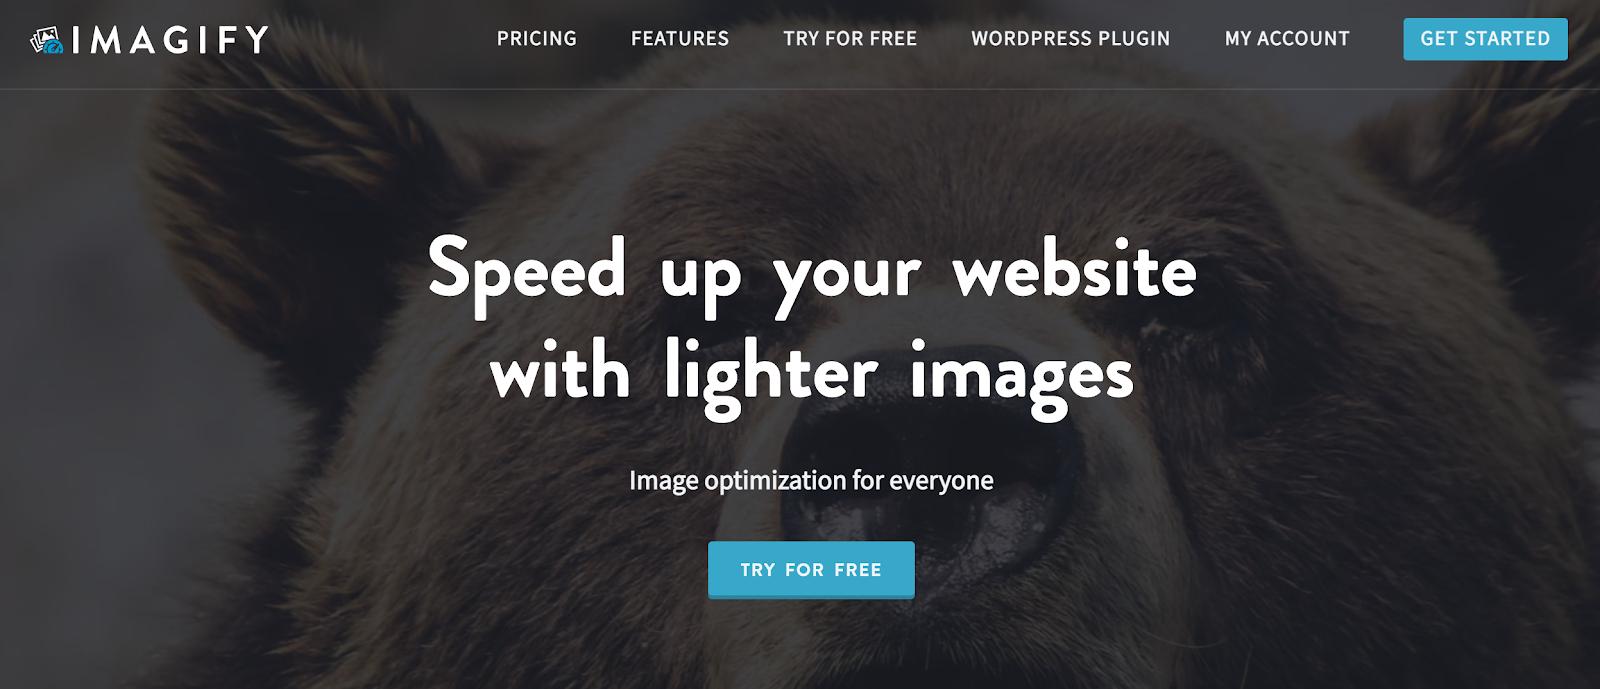 Imagify homepage